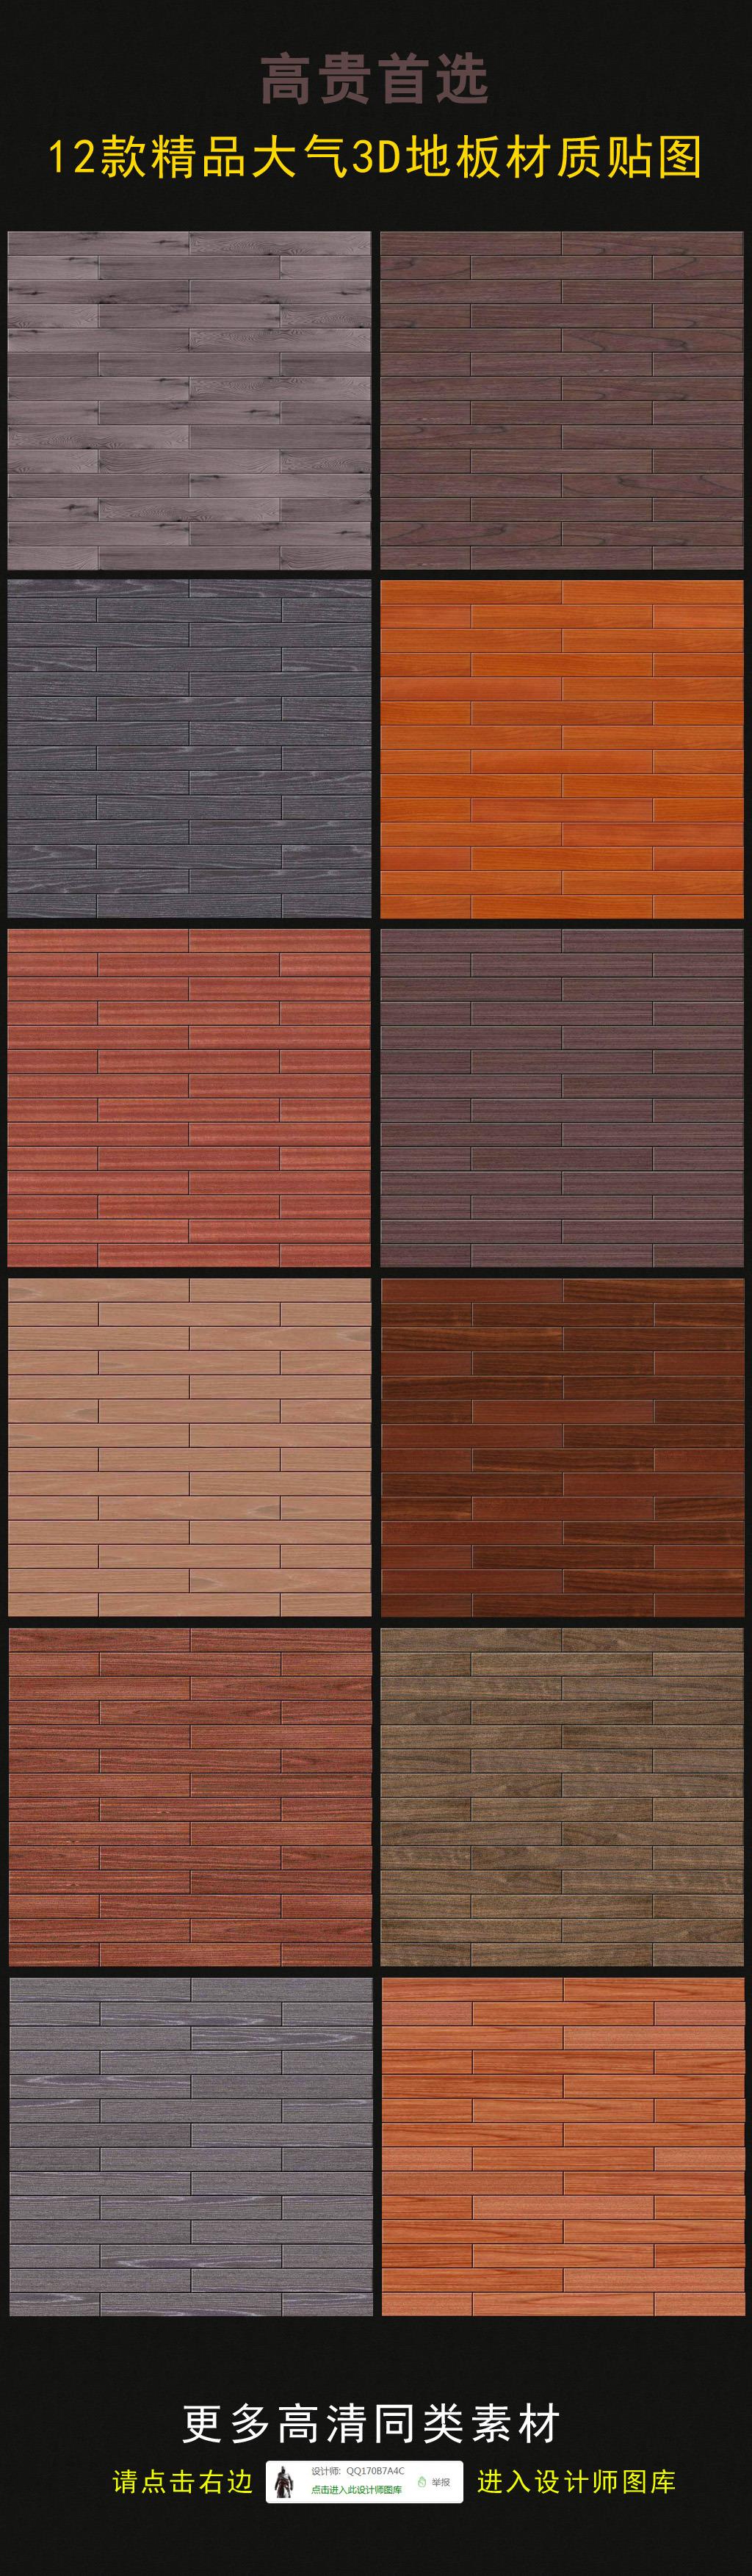 3d地板材质贴图